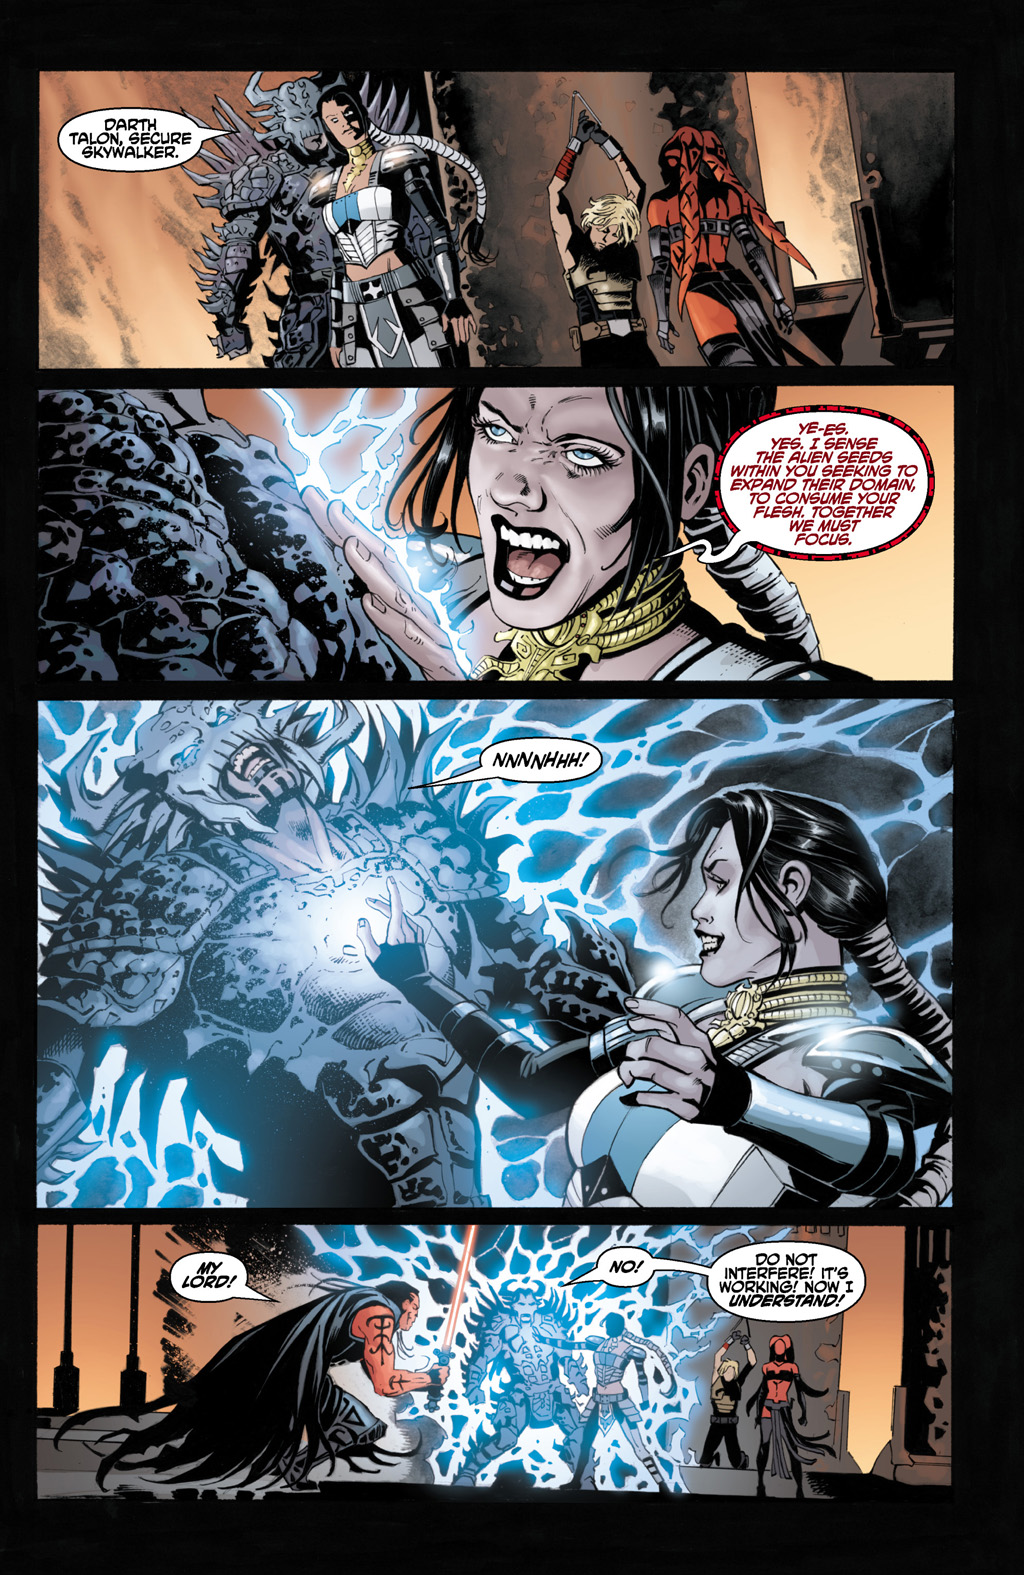 Comic-Only Fights Adapted To Novel Format LjGgSbzwbo9svZXoQdSLm9R2eHd30xCIR_6pxyFy9wXtz6XsghEtu6pLMKy-5TdFuo2q6s6EQbE=s1600